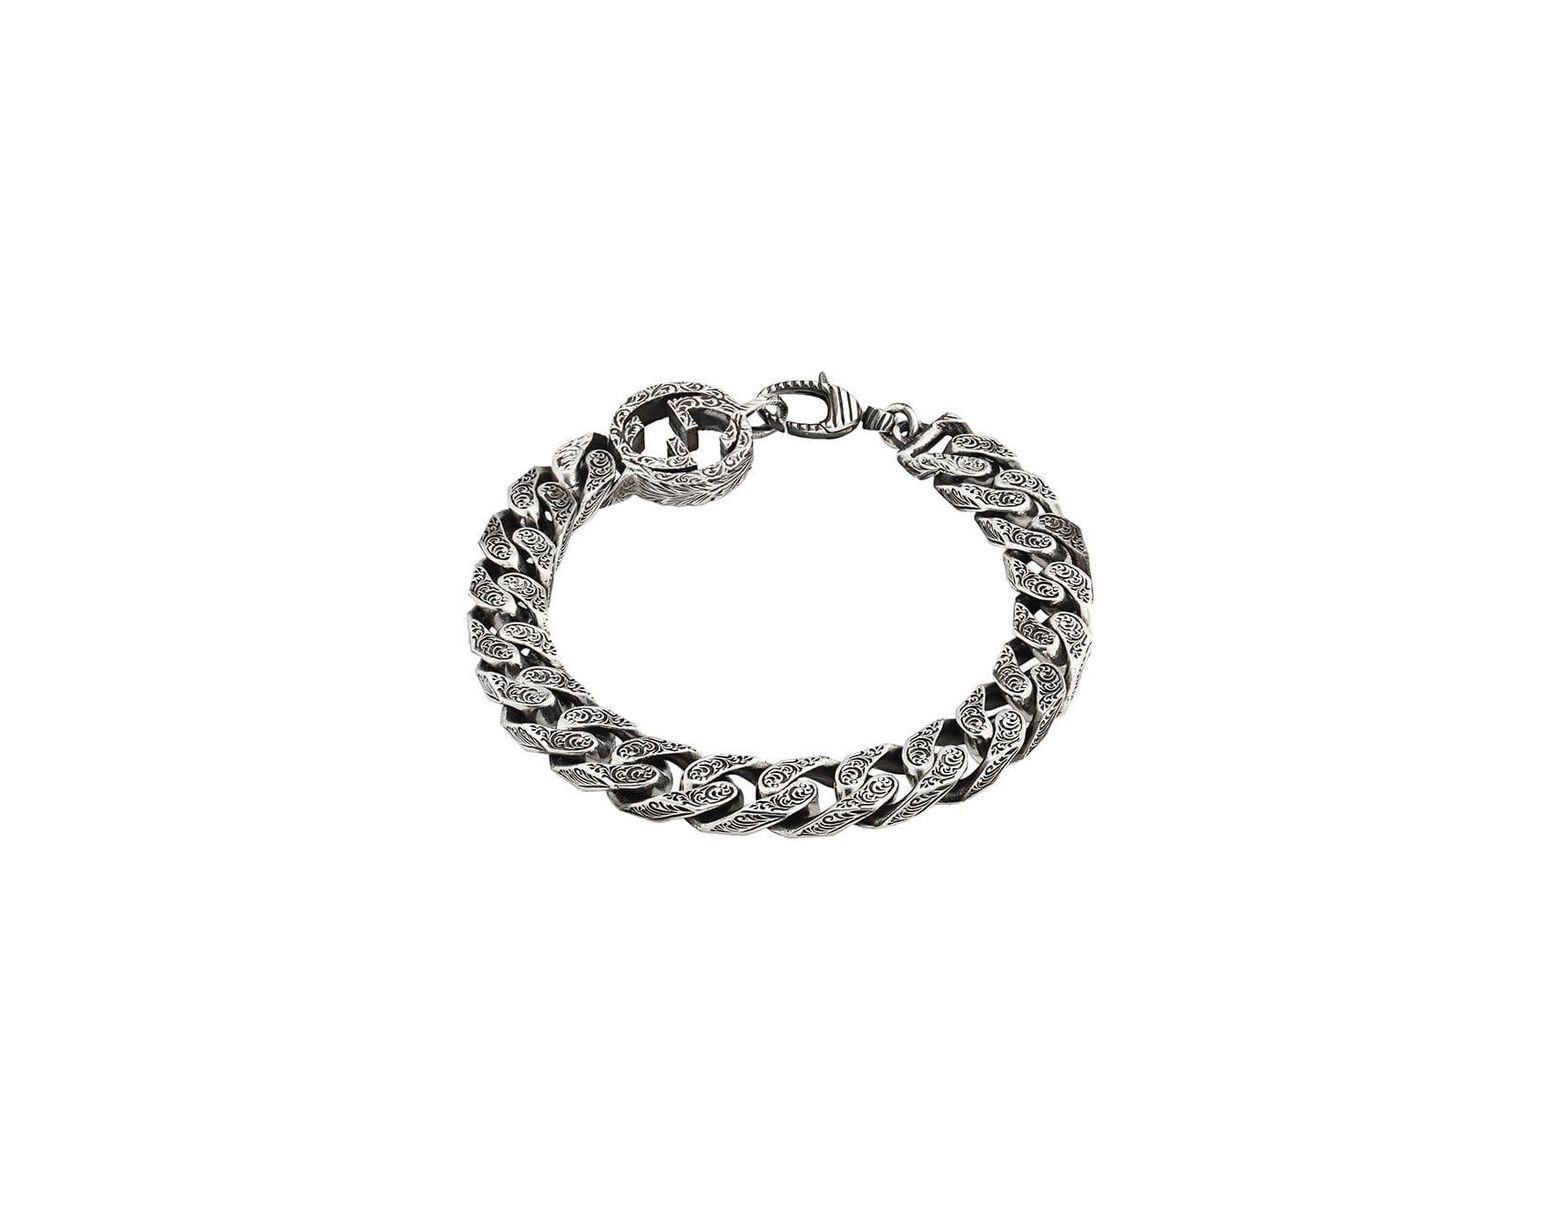 7ed09f512a3 Men's Metallic Interlocking G Chain Bracelet In Silver